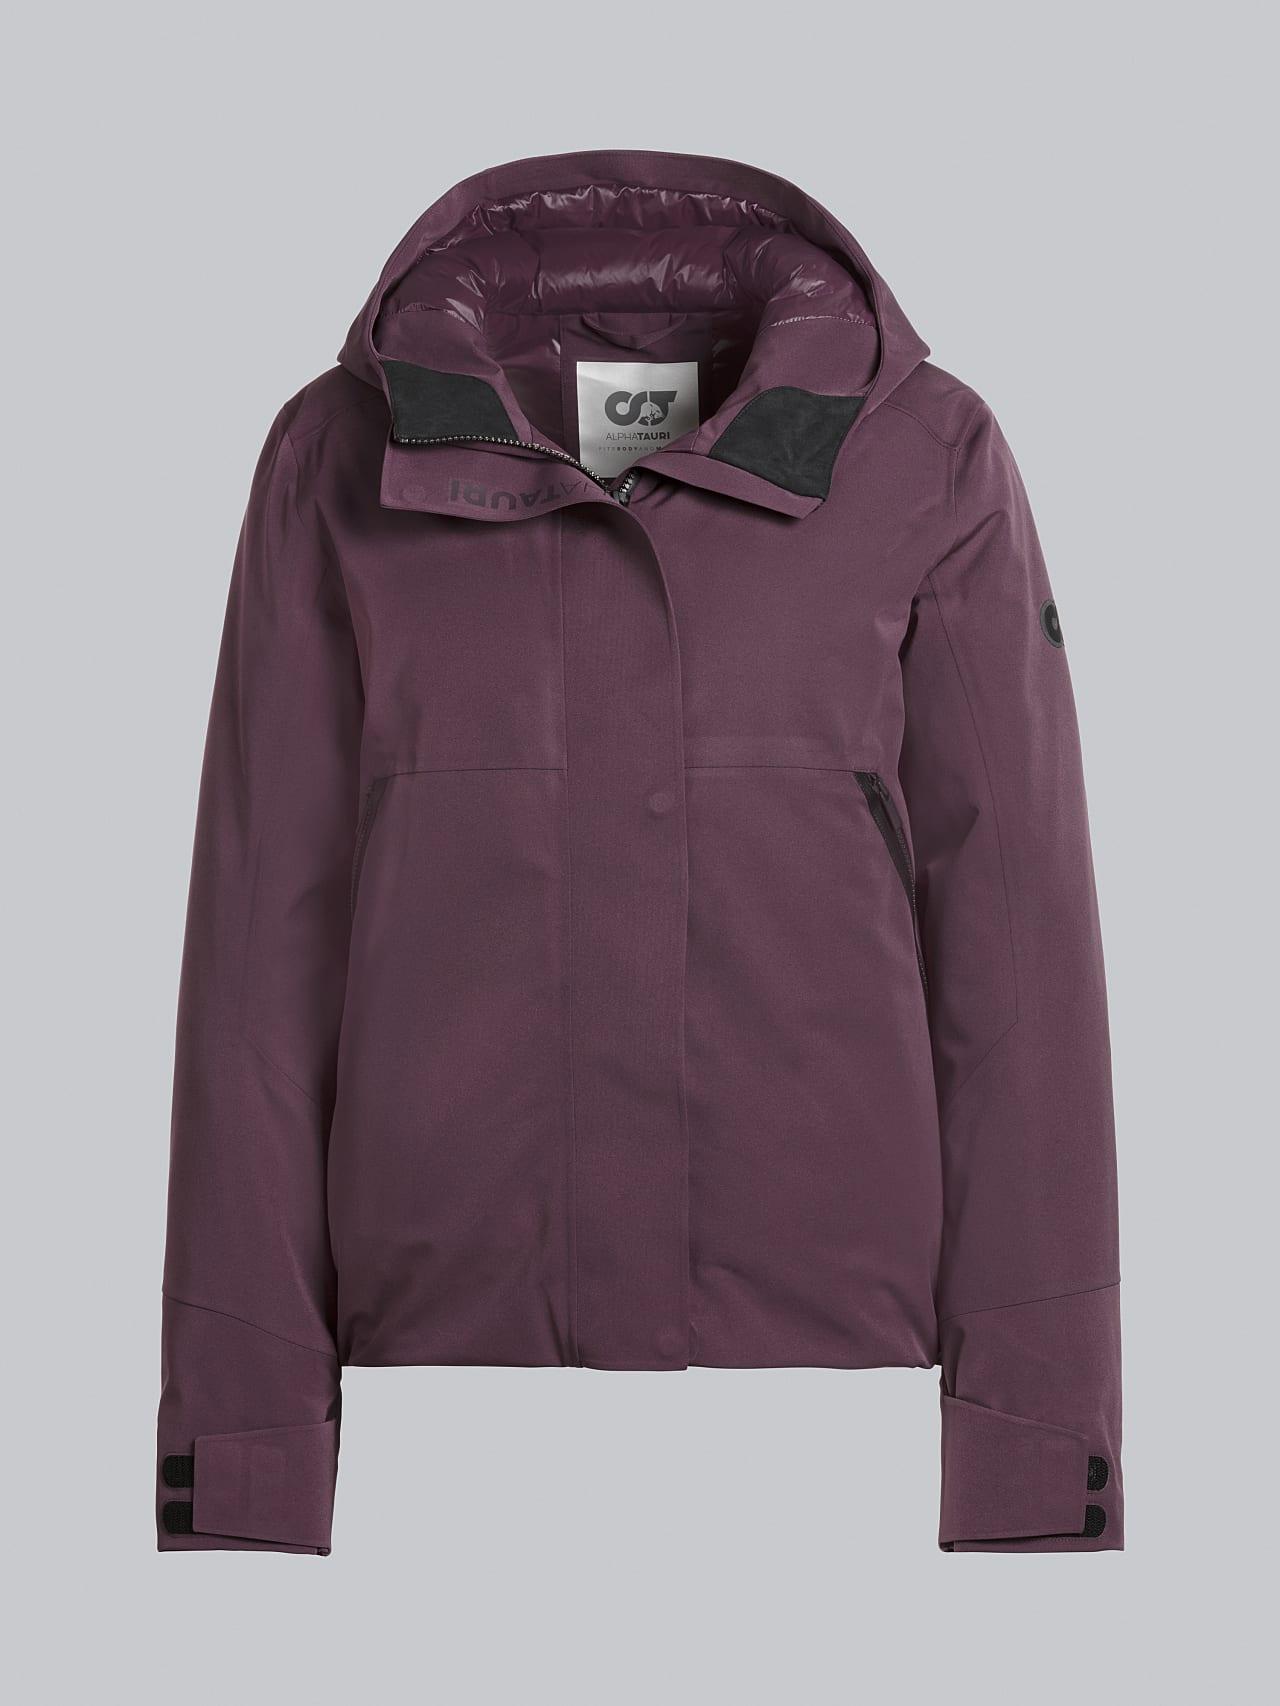 ONUVO V1.Y5.02 Packable Waterproof Jacket Burgundy Back Alpha Tauri